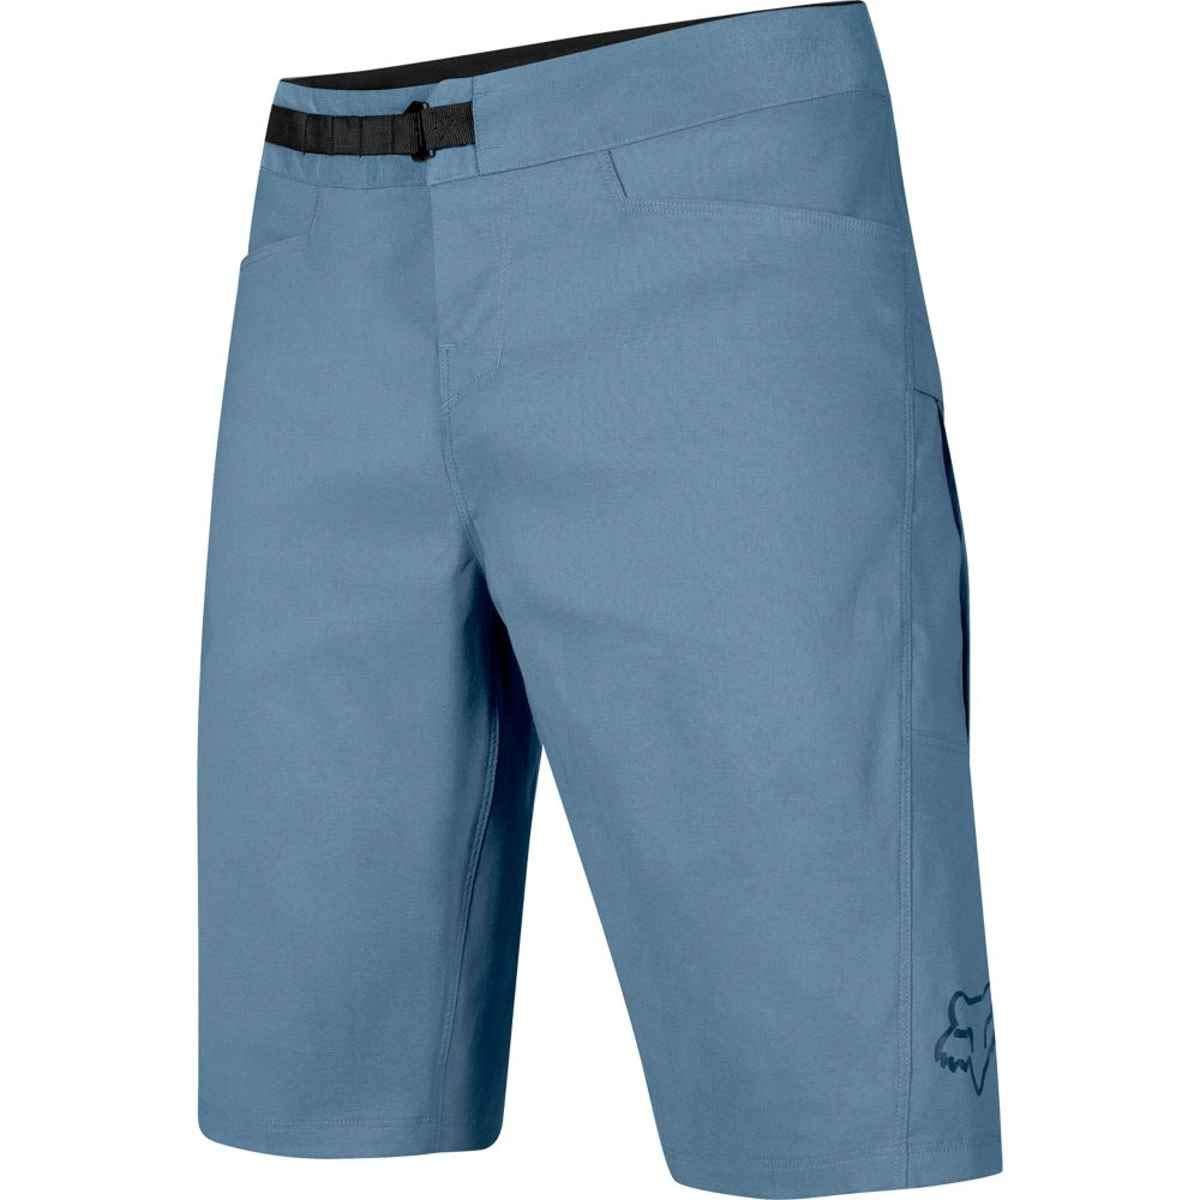 Fox Shorts Ranger Cargo Blue Steel, tamaño 30